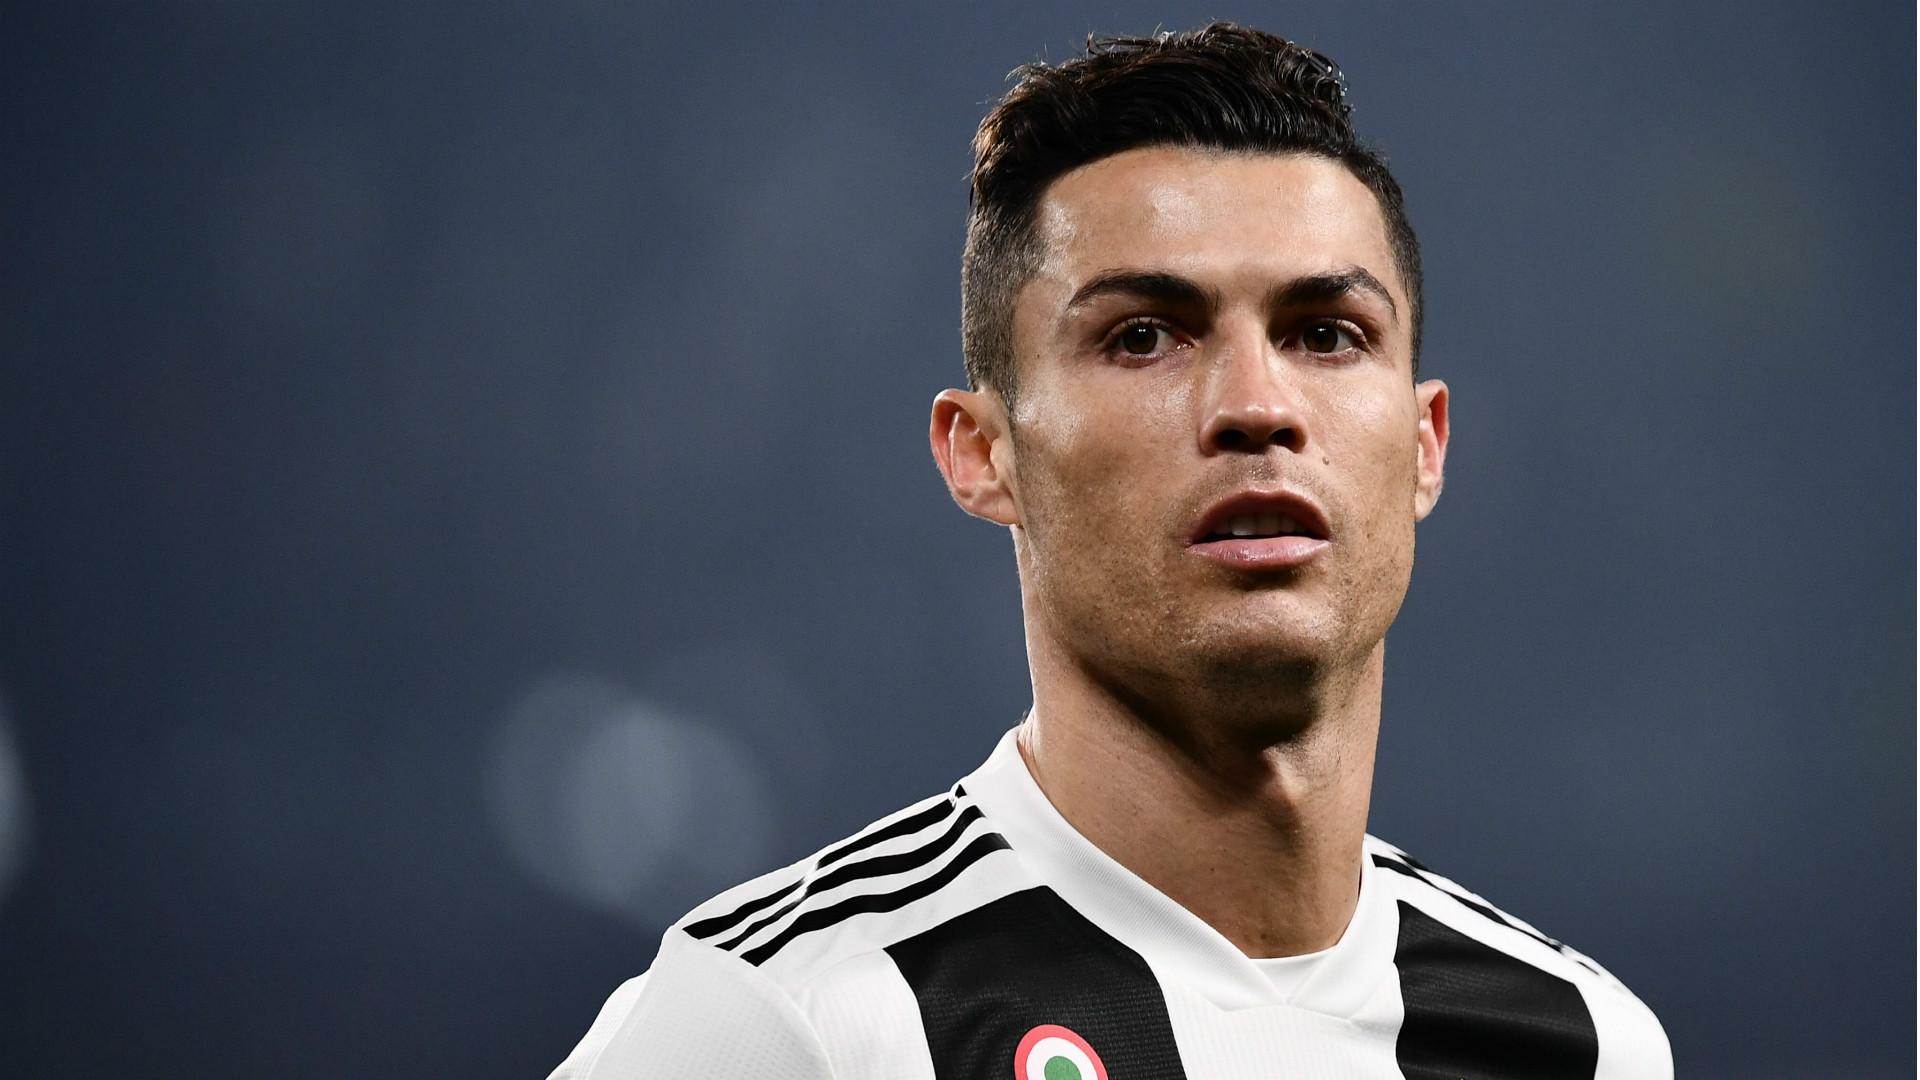 Suporter dari Real Madrid Belum Dapat Melupakan Cristiano Ronaldo